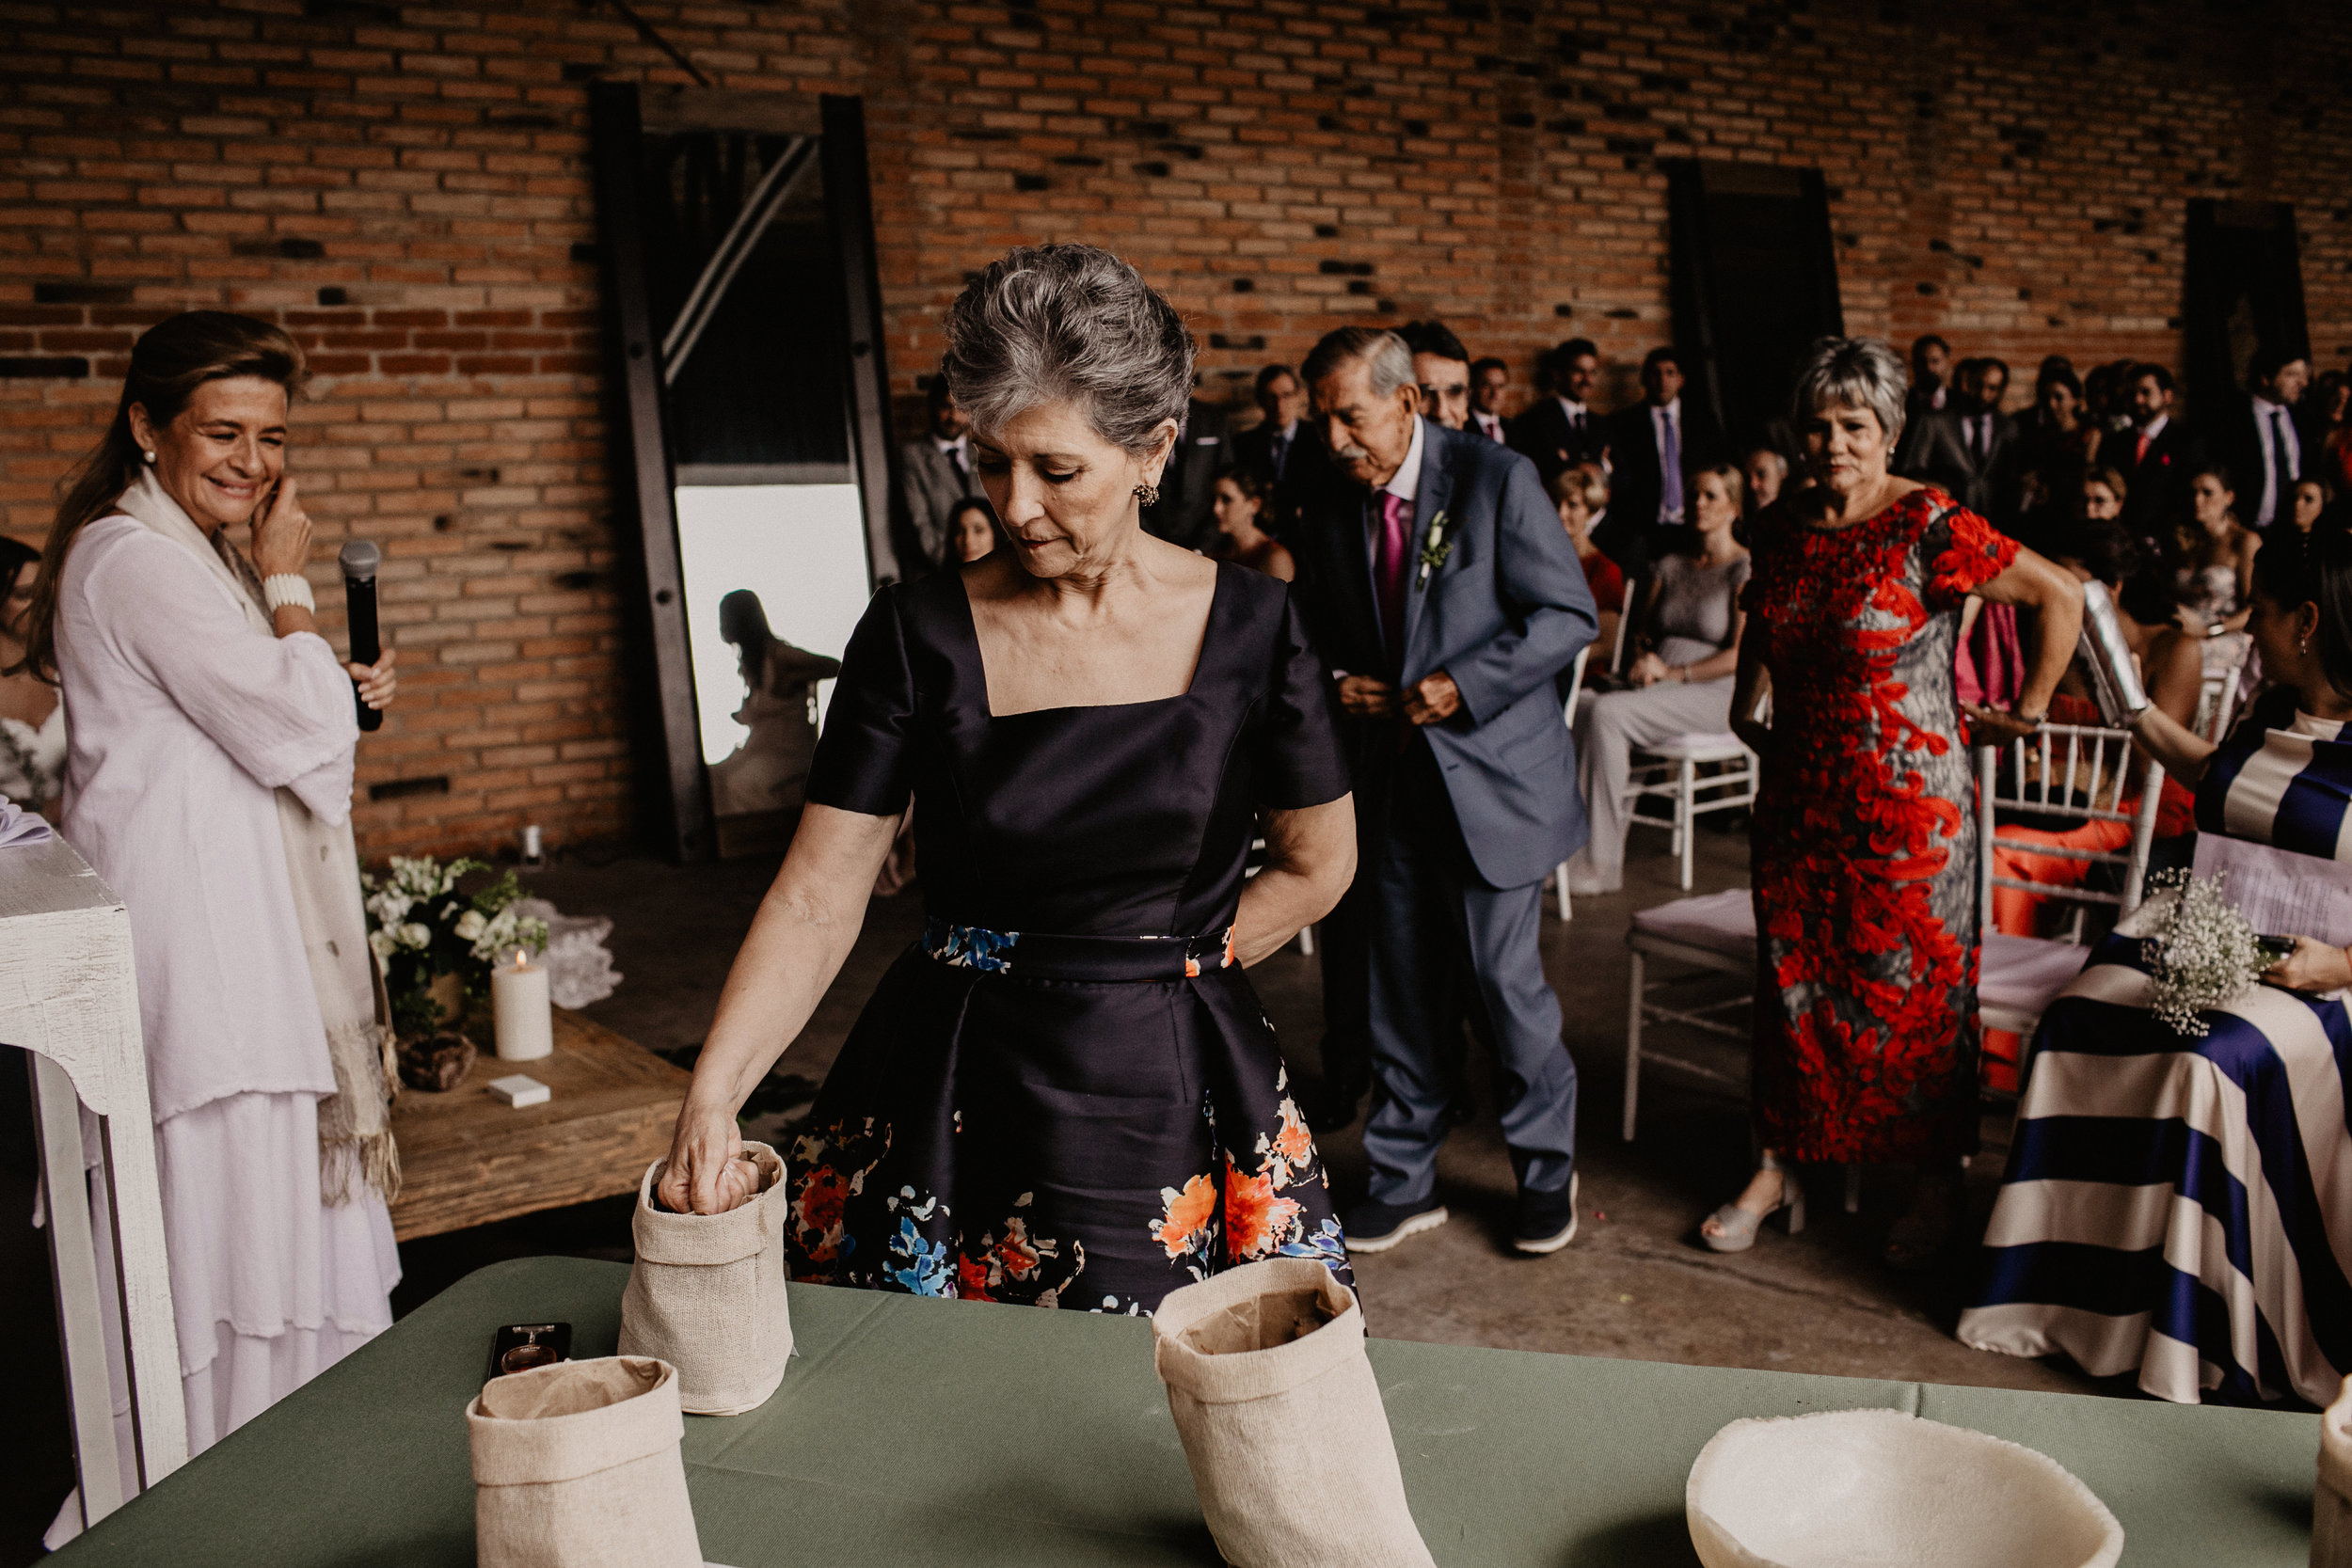 alfonso_flores_destination_wedding_photographer_pau_alonso_526.JPG